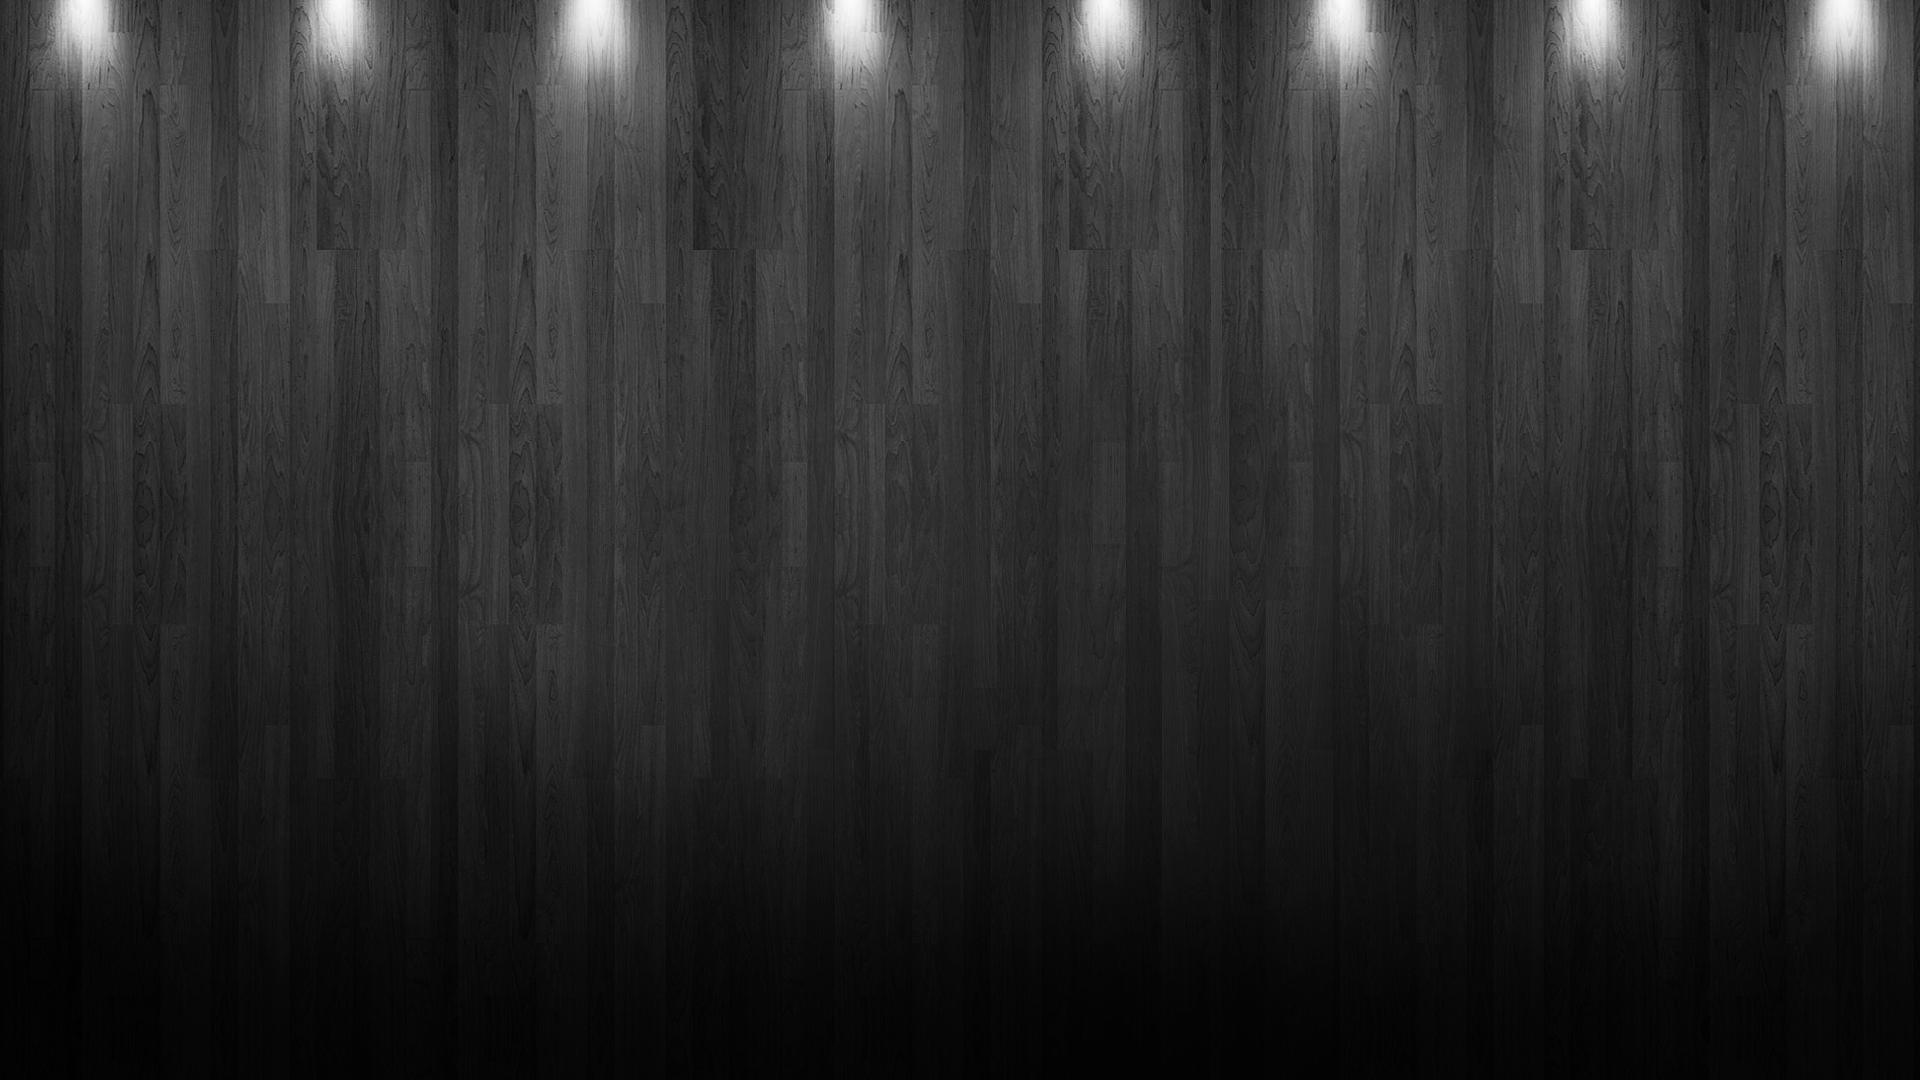 wallpaper.wiki-Free-hd-dark-wallpaper-download-PIC-